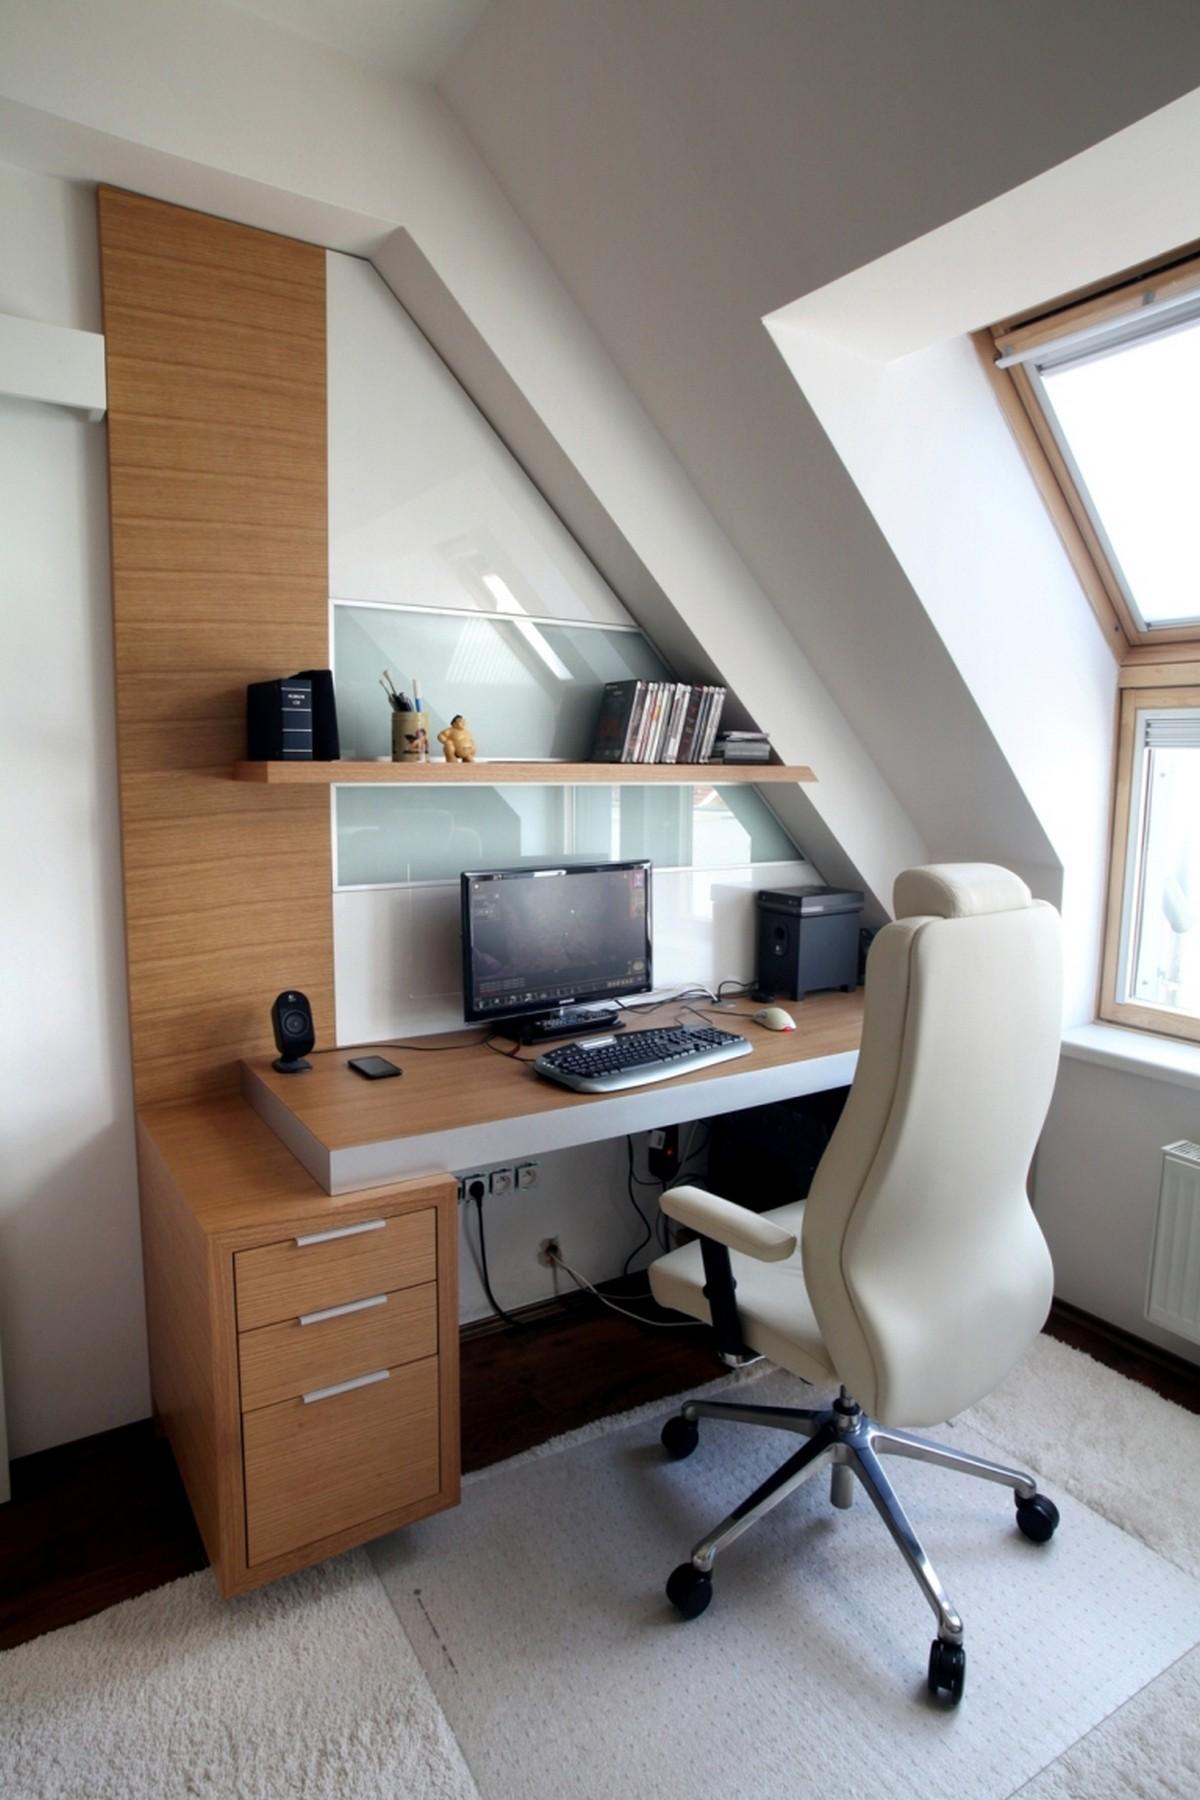 Chic Modern Apartment Interior Decoration in Small Area